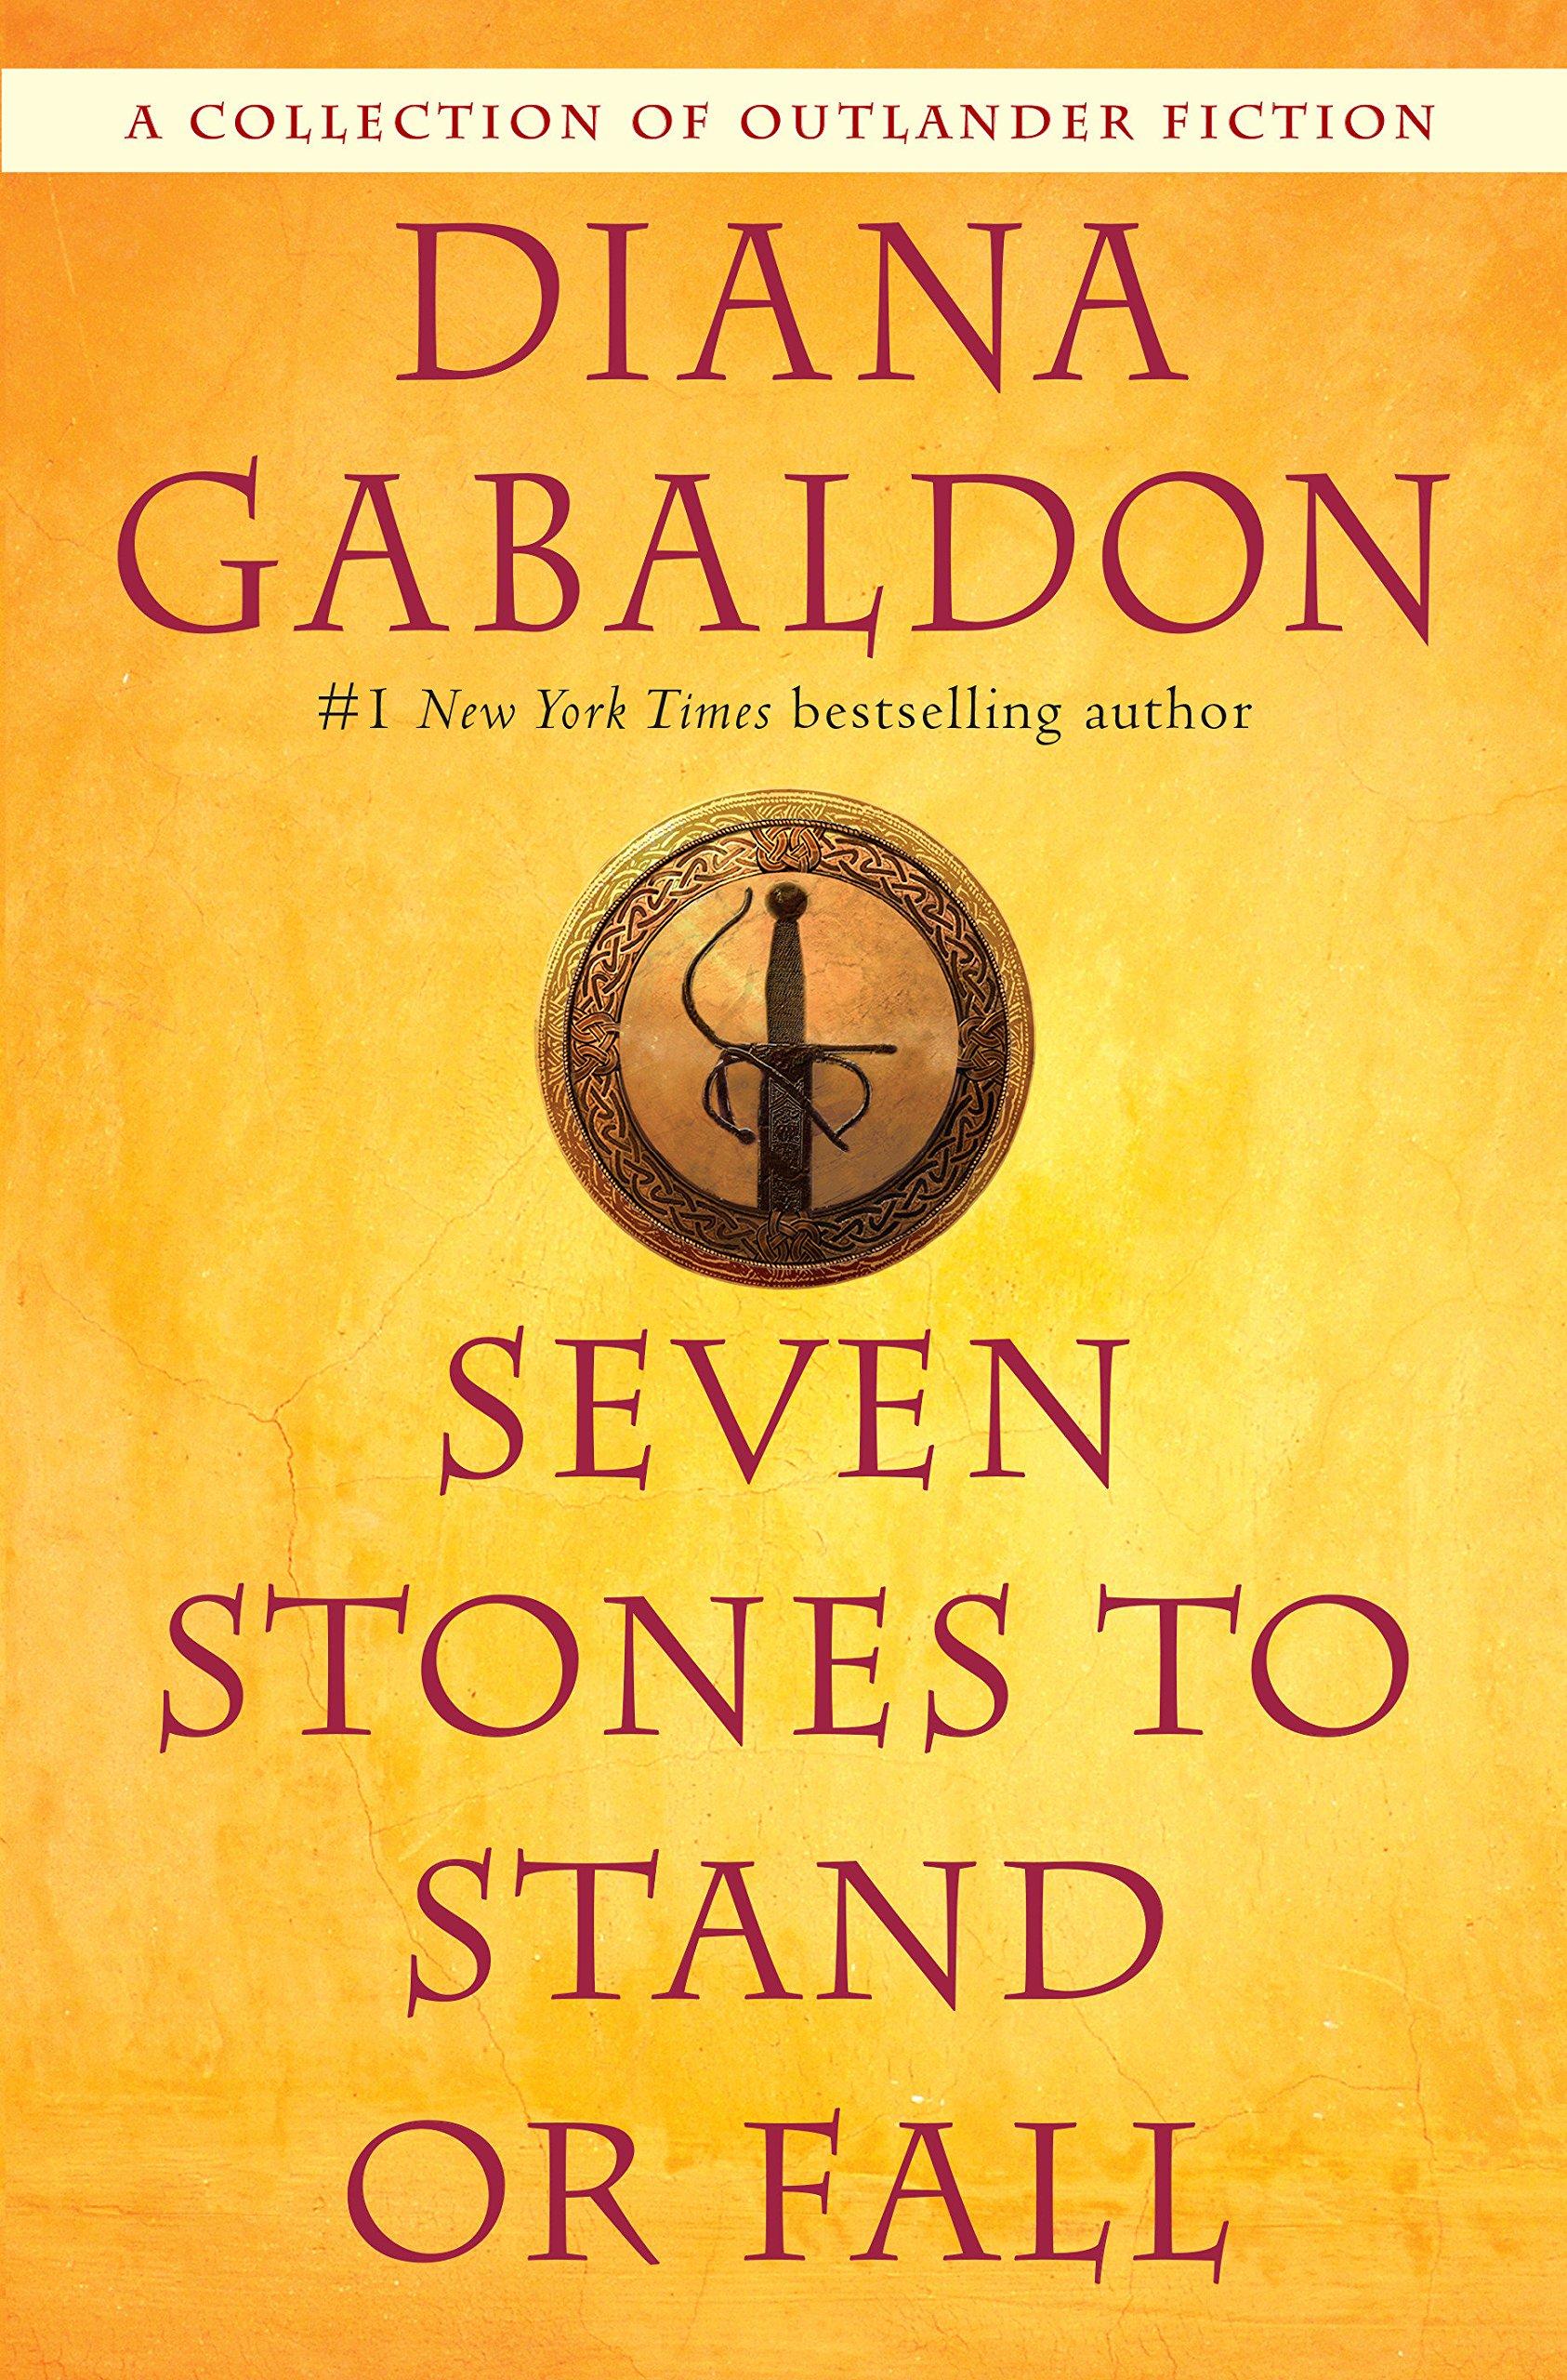 Seven Stones to Stand or Fall: A Collection of Outlander Fiction por Diana Gabaldon